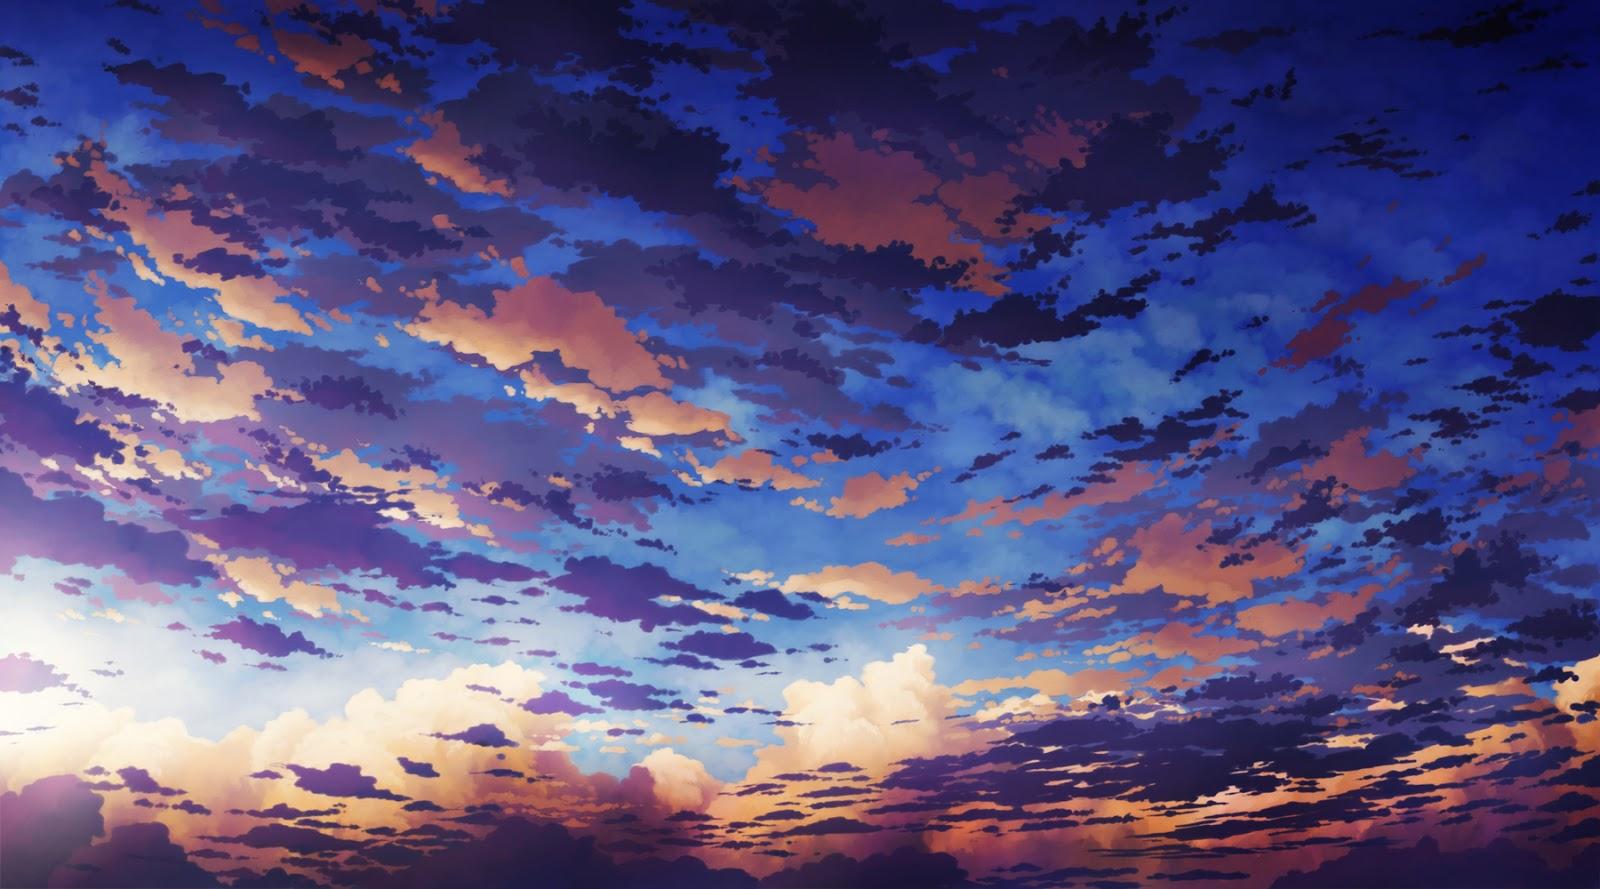 Phone Wallpaper Boy And Girl Sunset Anime Anime Landscape Sky Anime Background